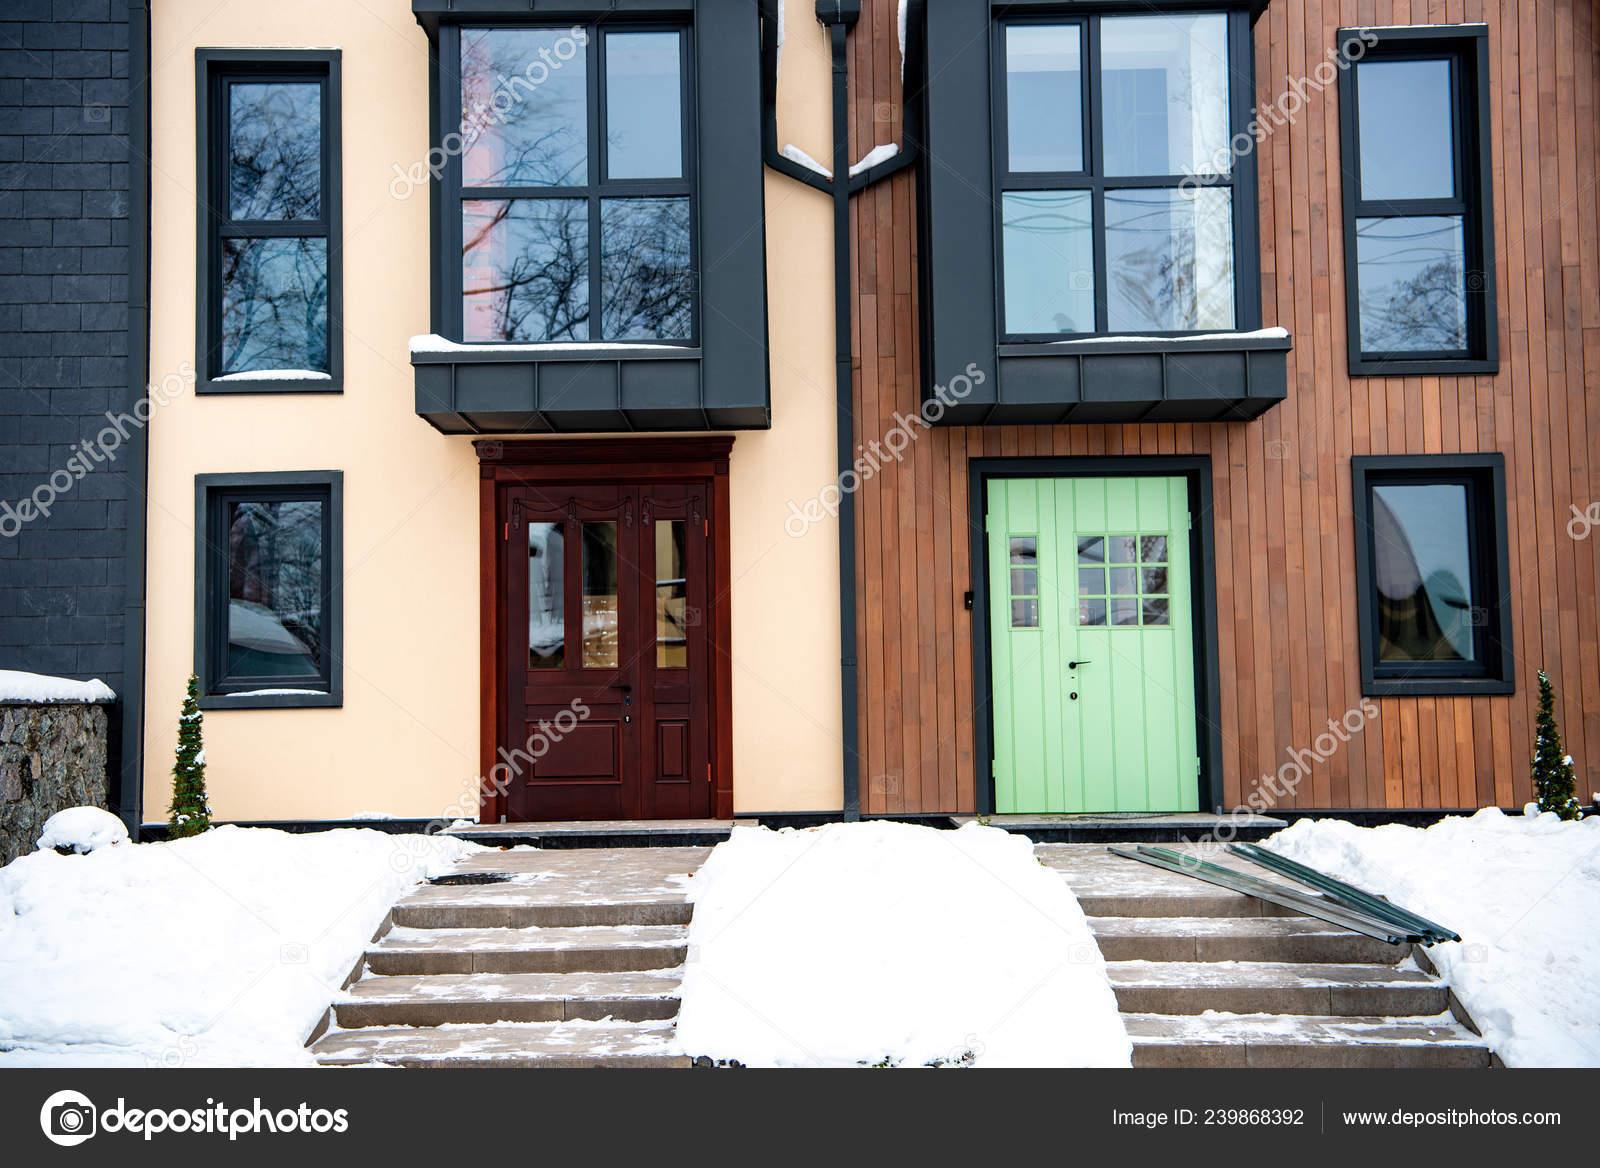 Pictures Houses Windows Stylish Modern Houses Windows Doors Winter Stock Photo C Vitalikradko 239868392